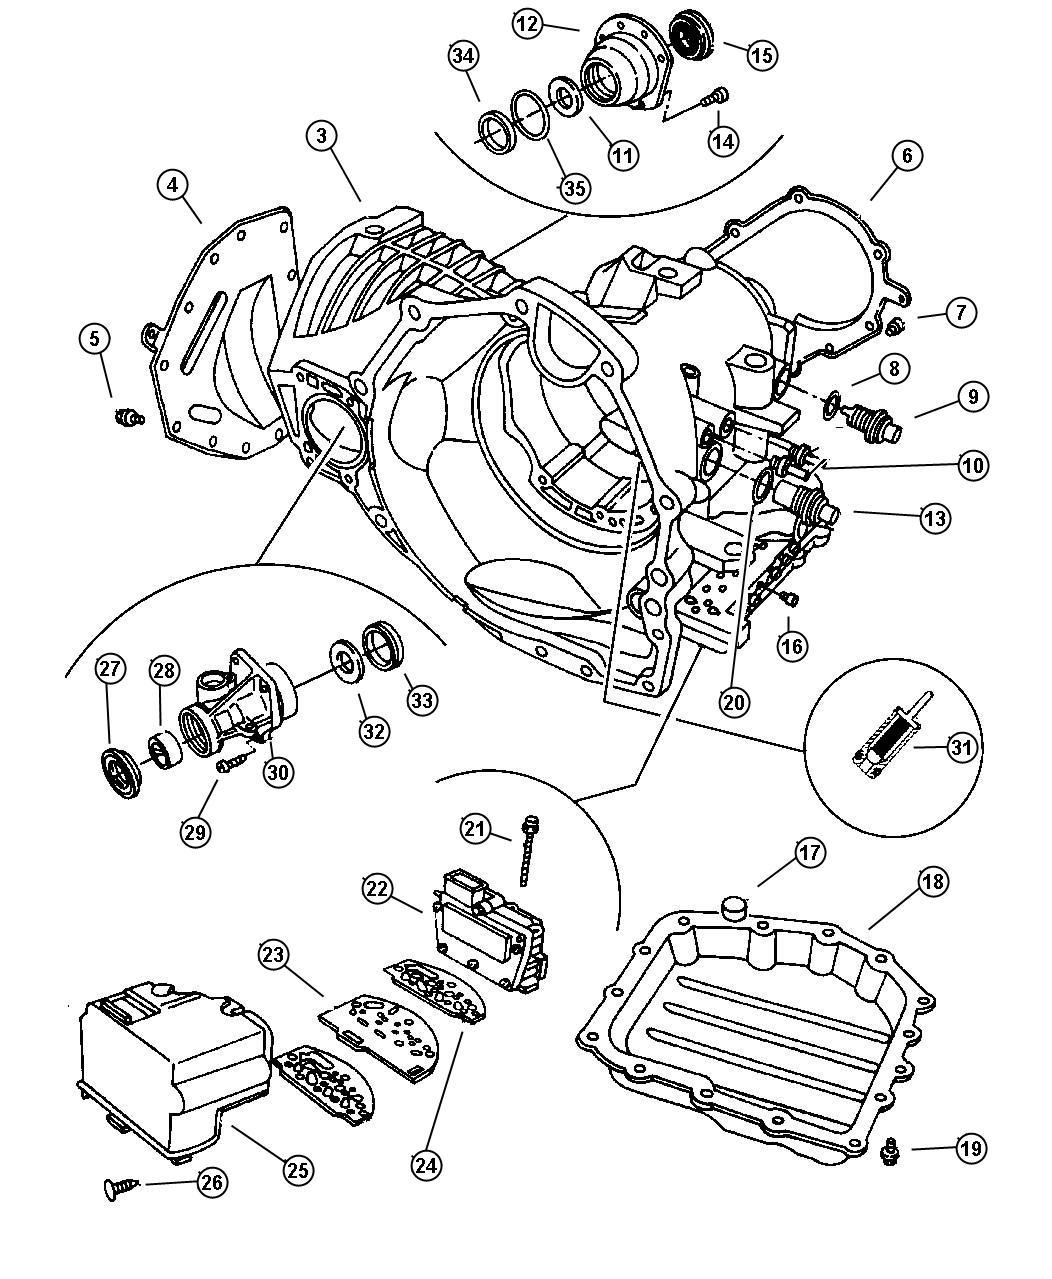 Chrysler Transaxle A604 manual download